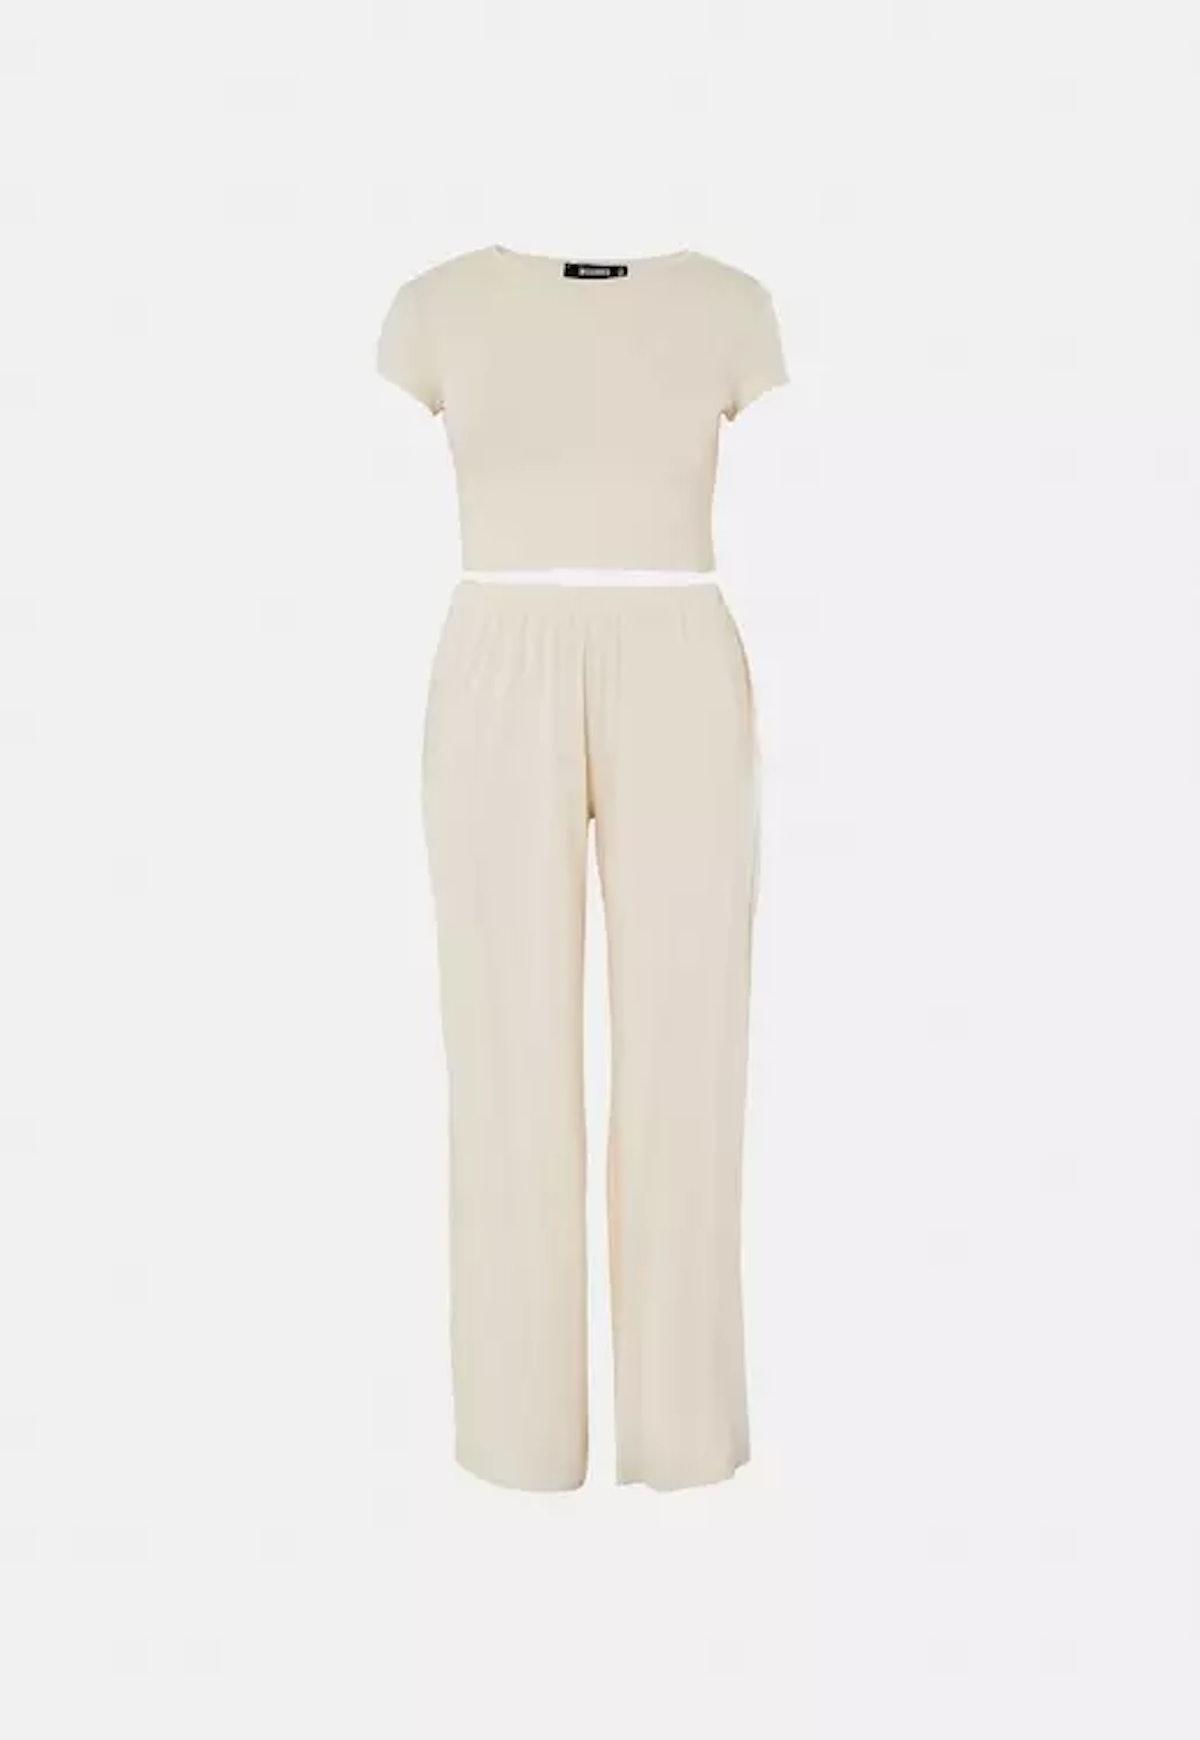 Missguided Tall Beige Crop Top And Wide Leg Pants Pyjama Set